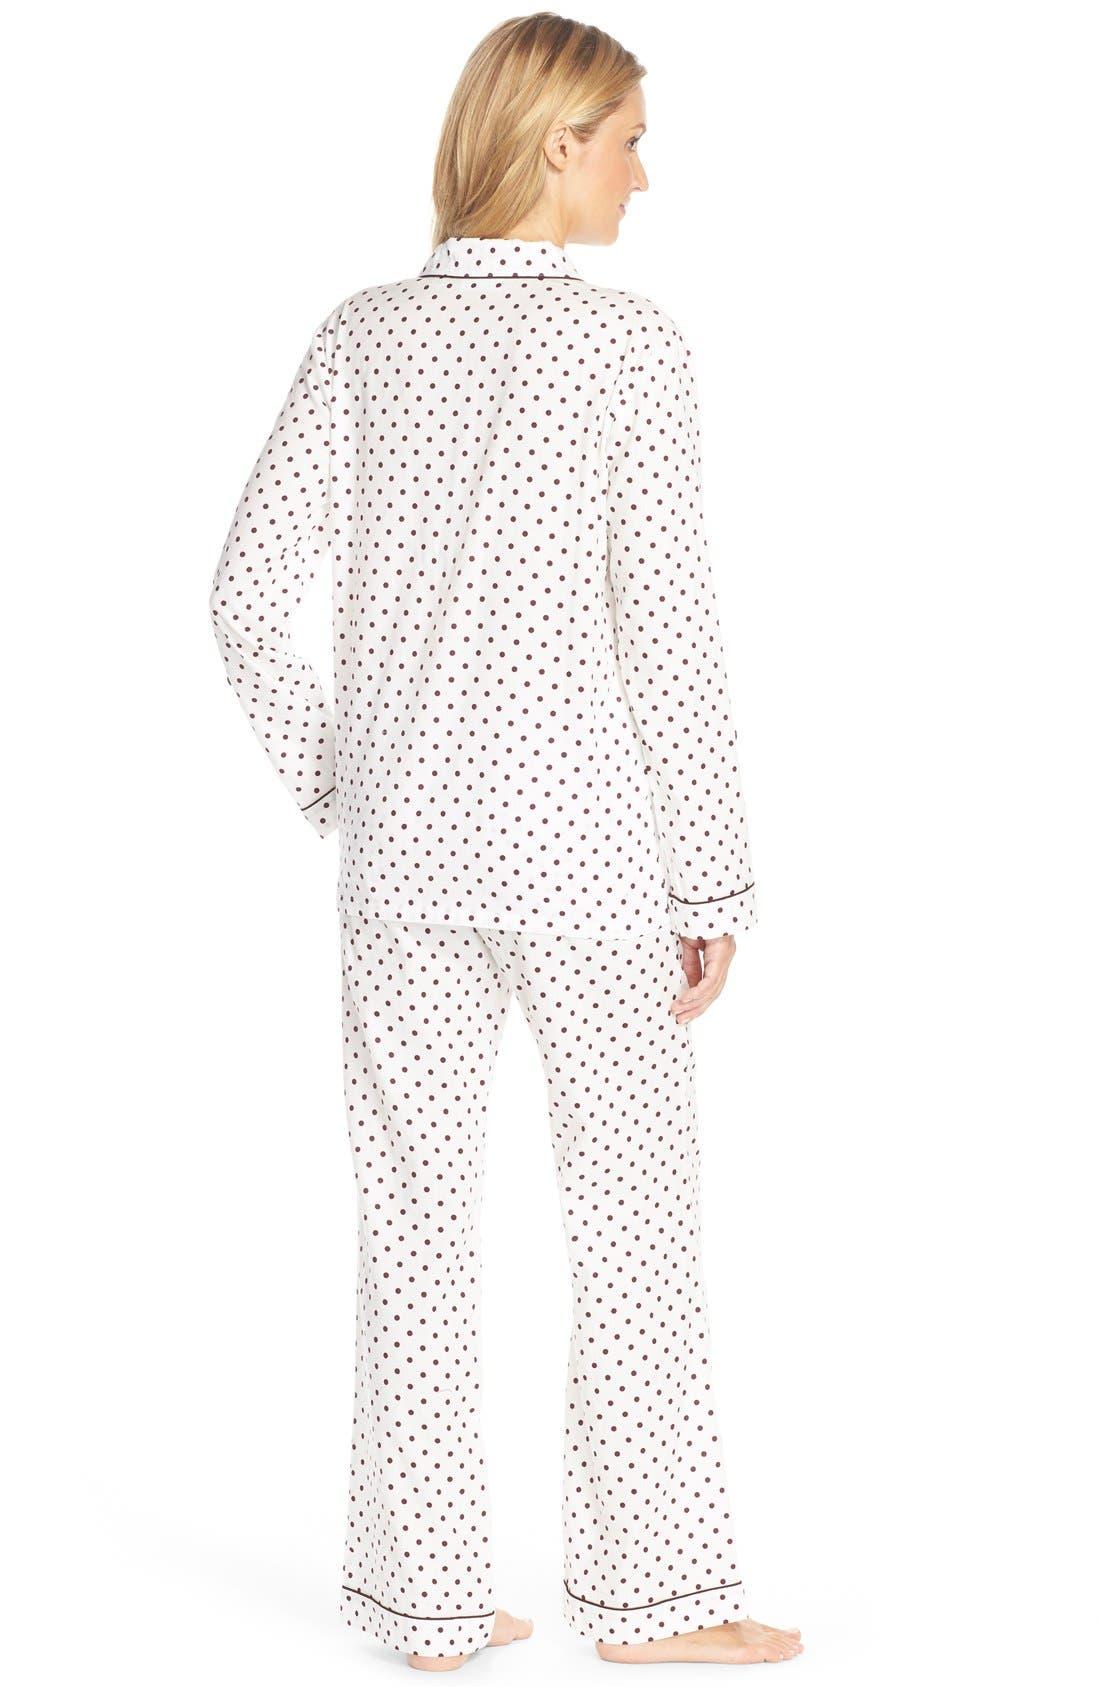 Cotton Twill Pajamas,                             Alternate thumbnail 30, color,